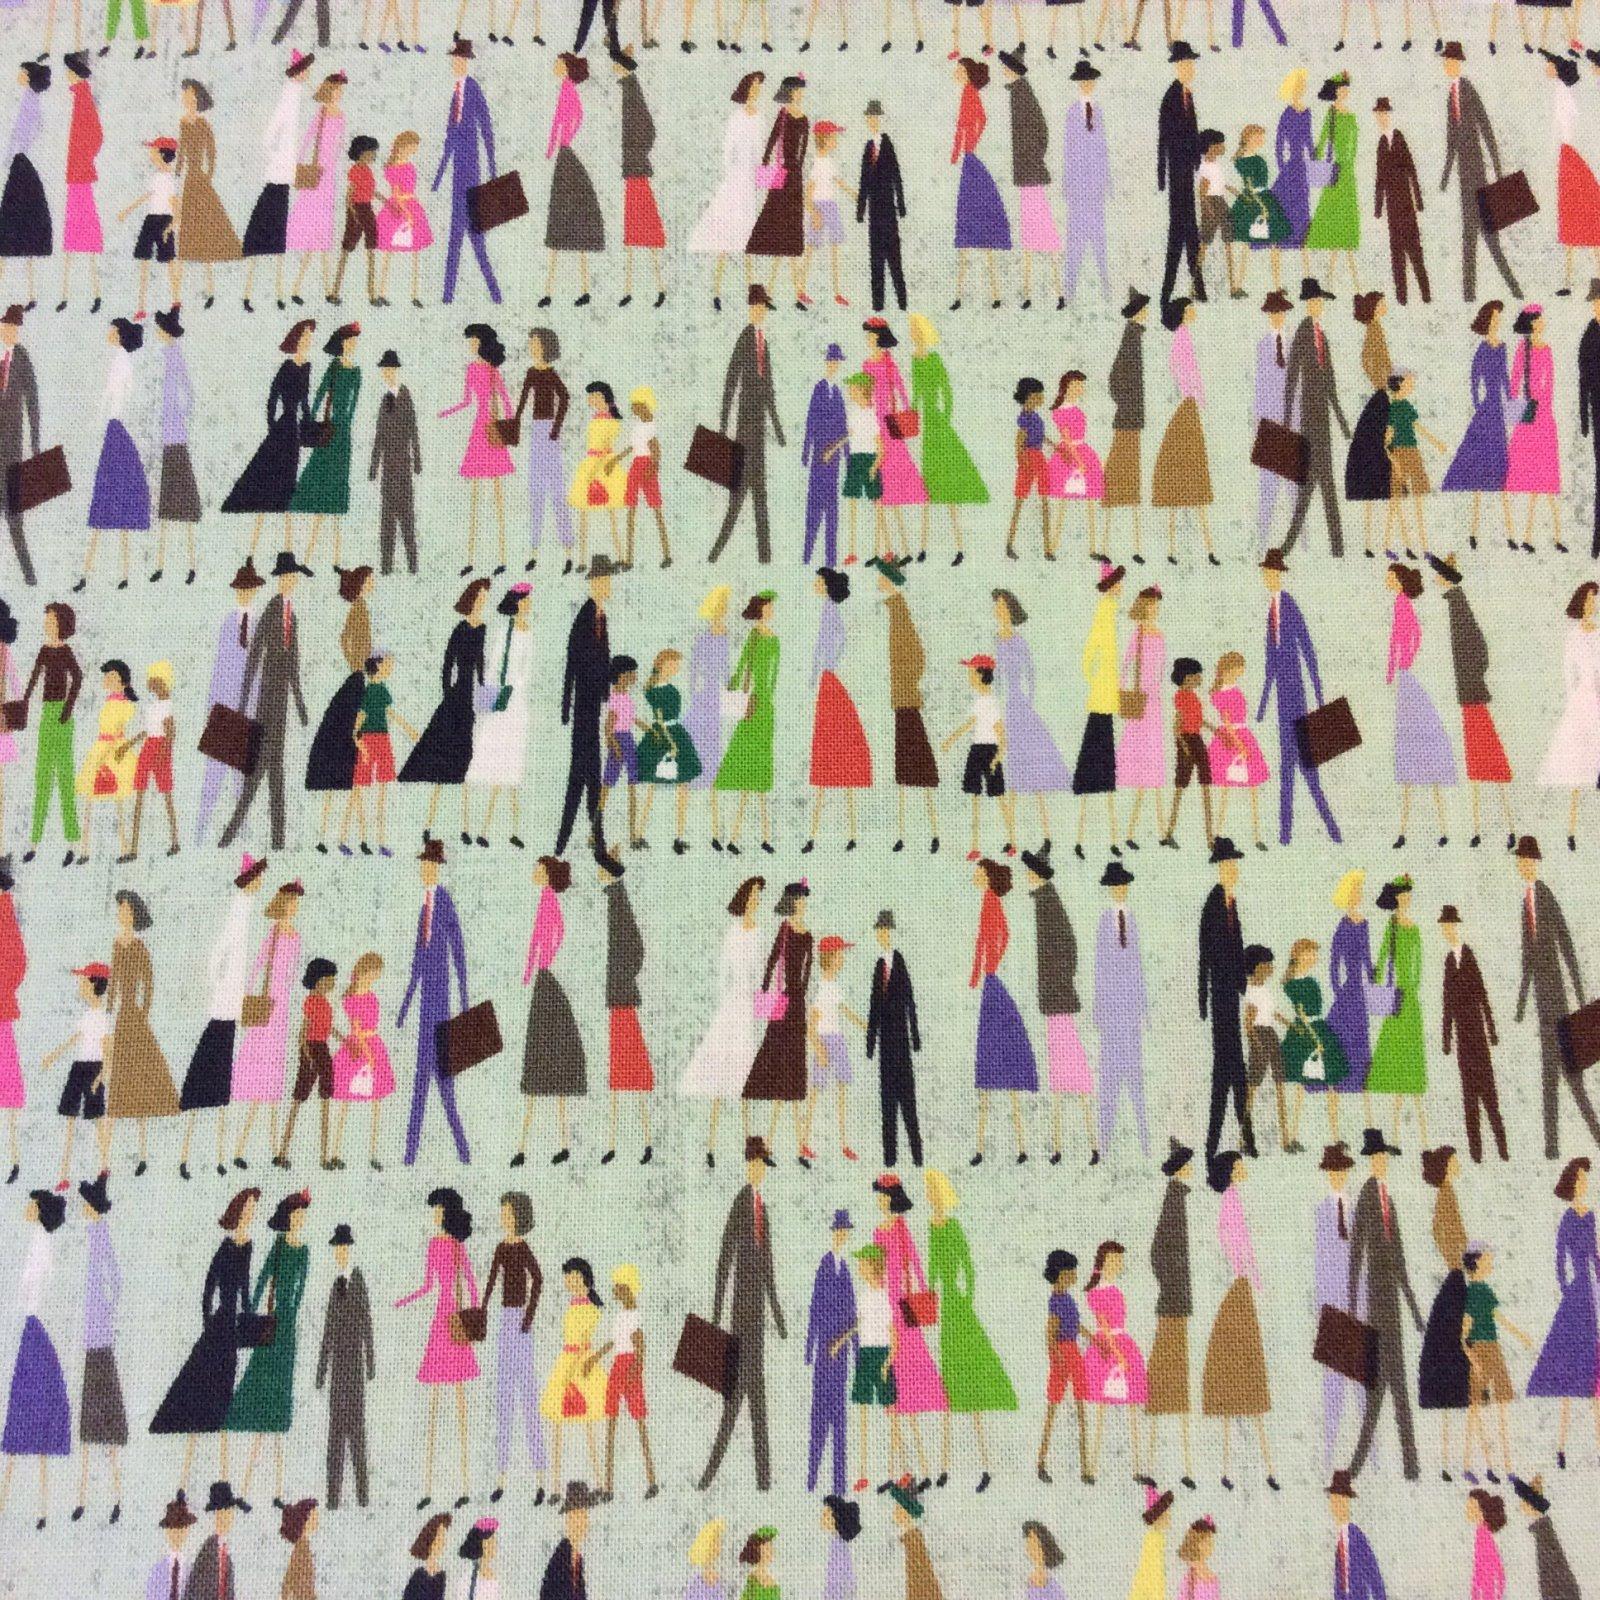 MO98 City People Travel Urban New York Paris Shopping Cute Cotton Quilt Fabric